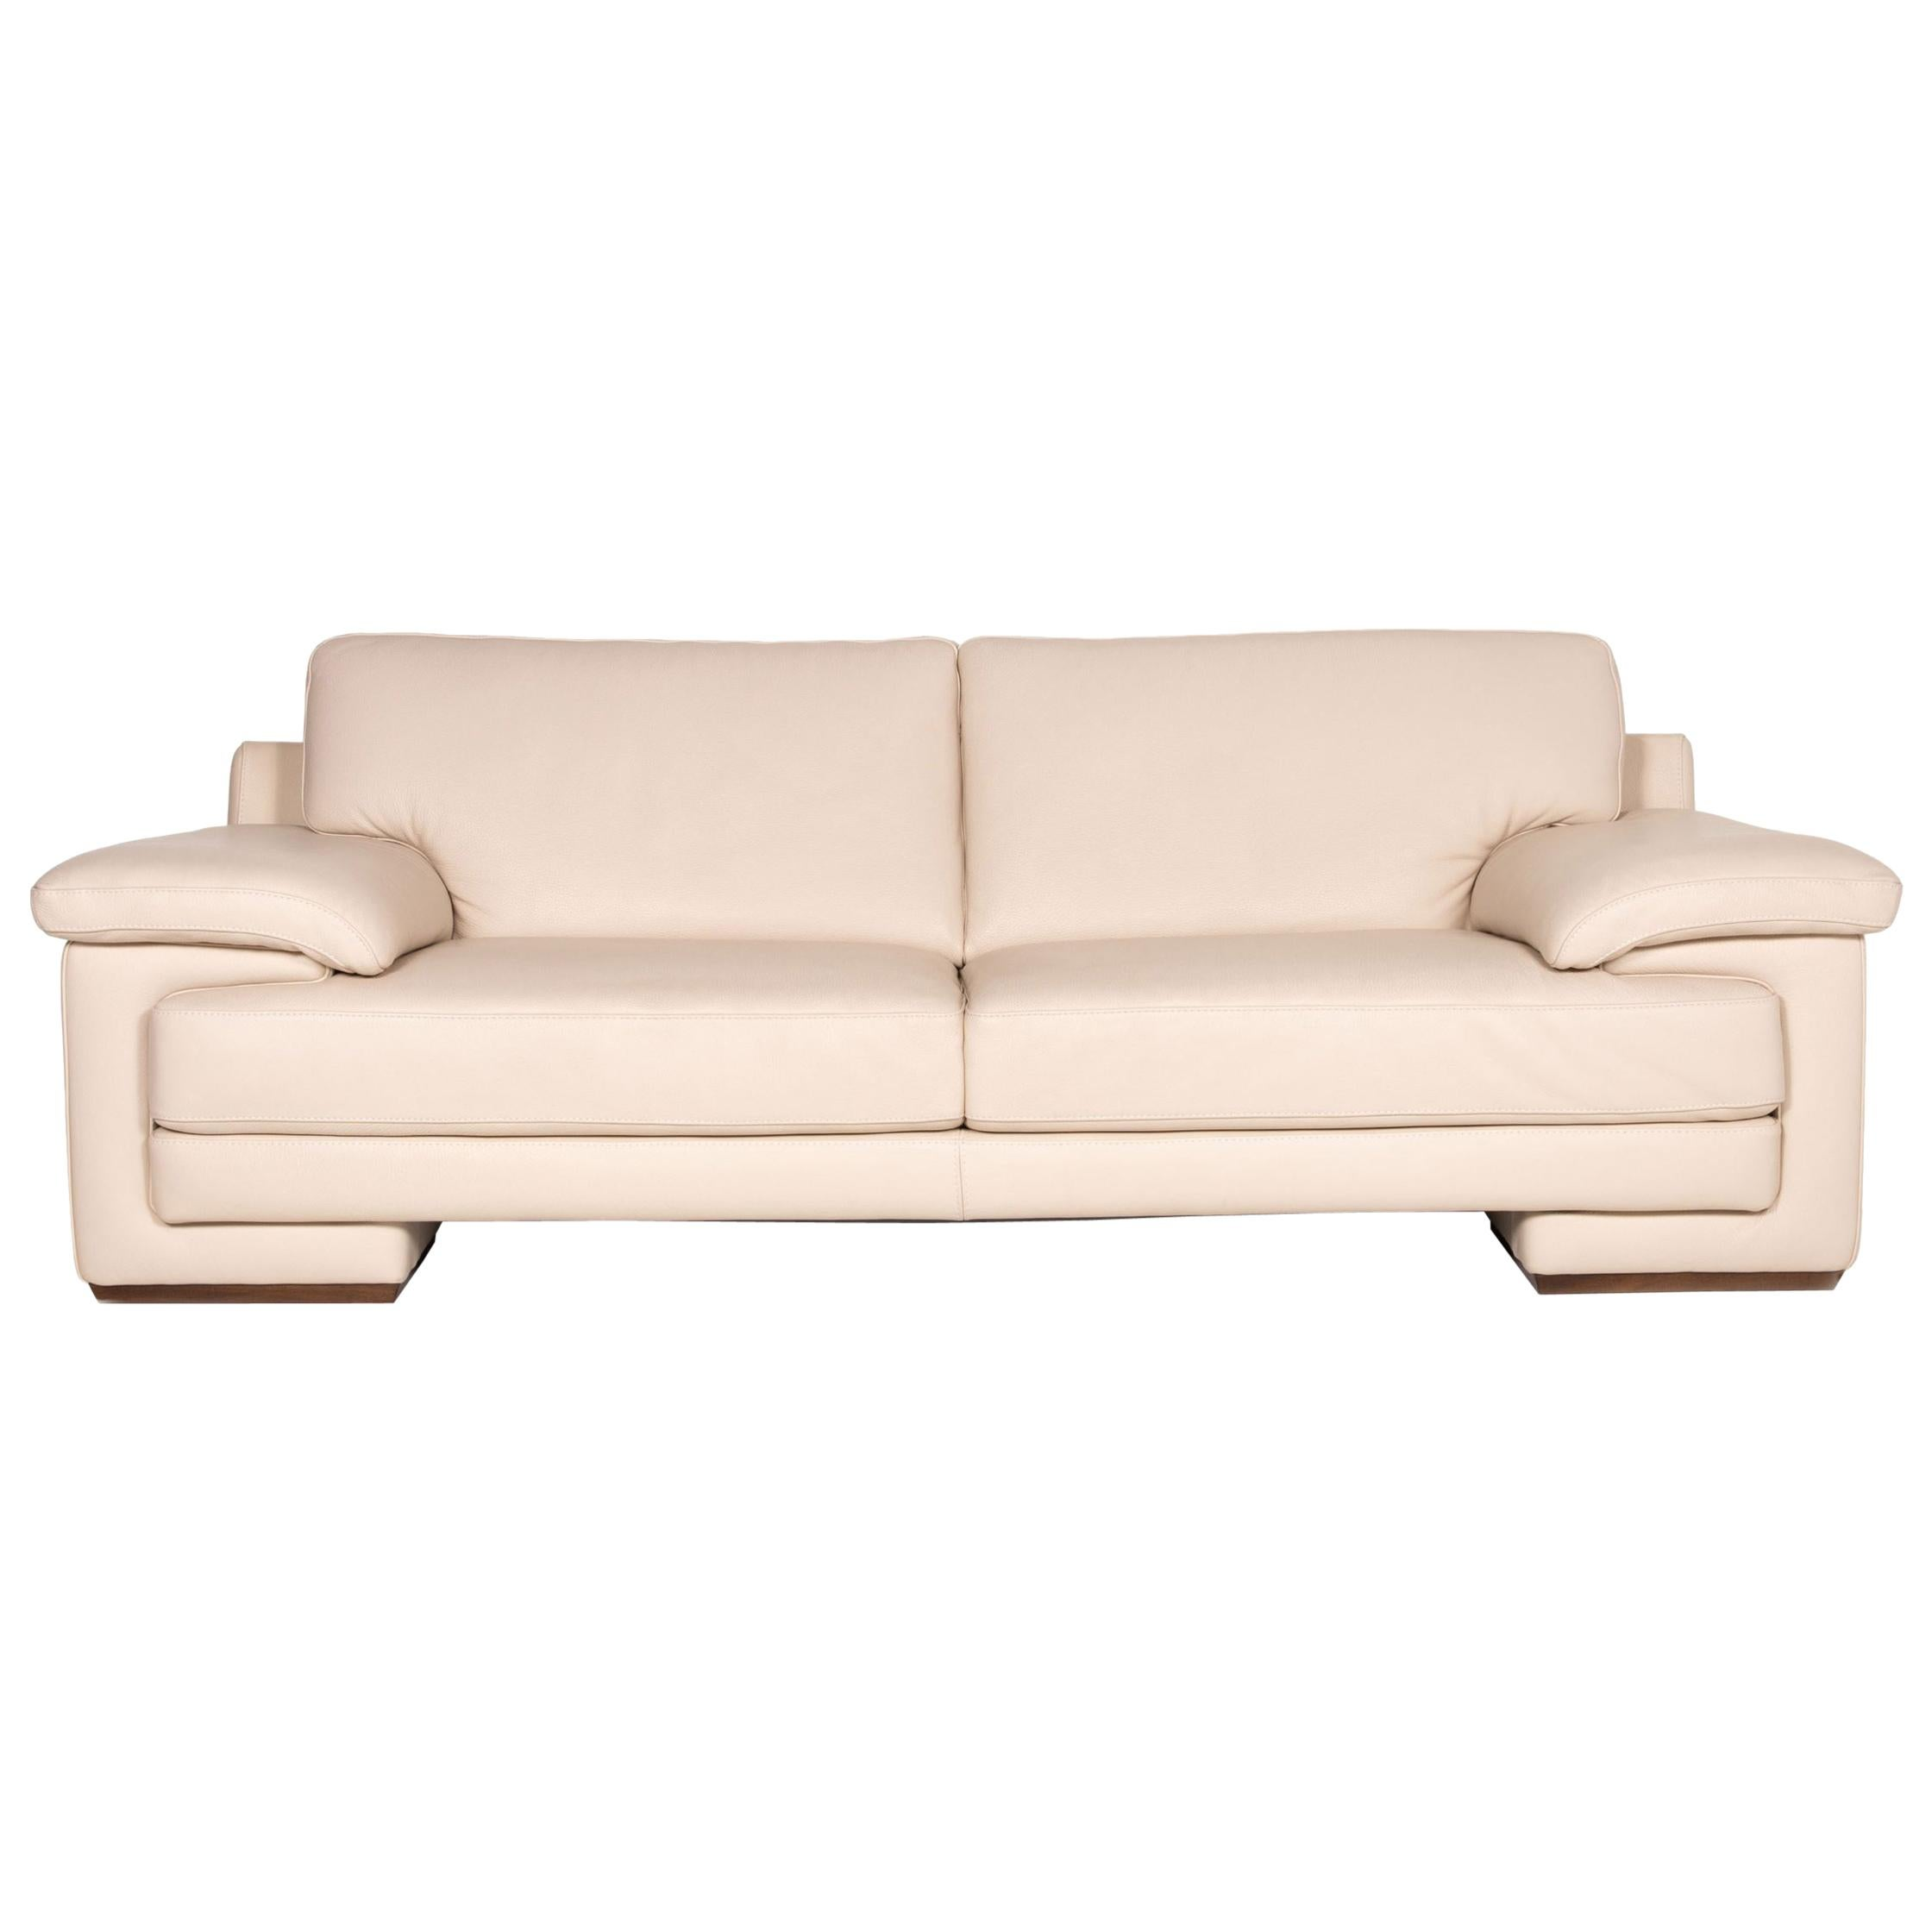 Natuzzi 2198 Leather Sofa Cream Three-Seater Couch